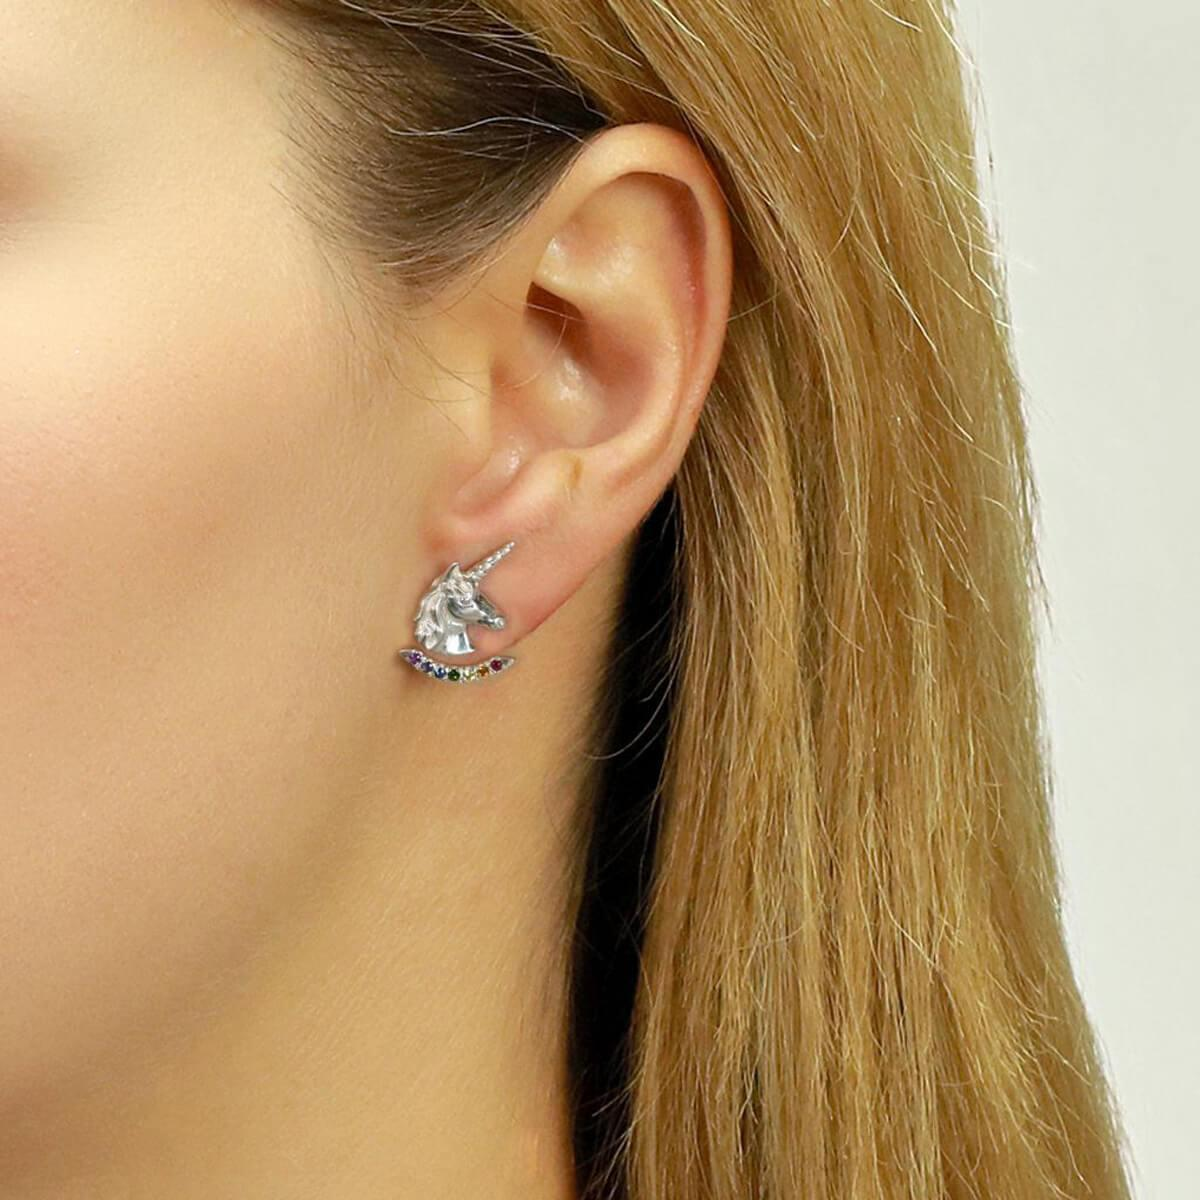 Jana Reinhardt Yellow Gold Plated Unicorn Earrings With Rainbow Ear Jackets Gold Plating ZAXlVZS